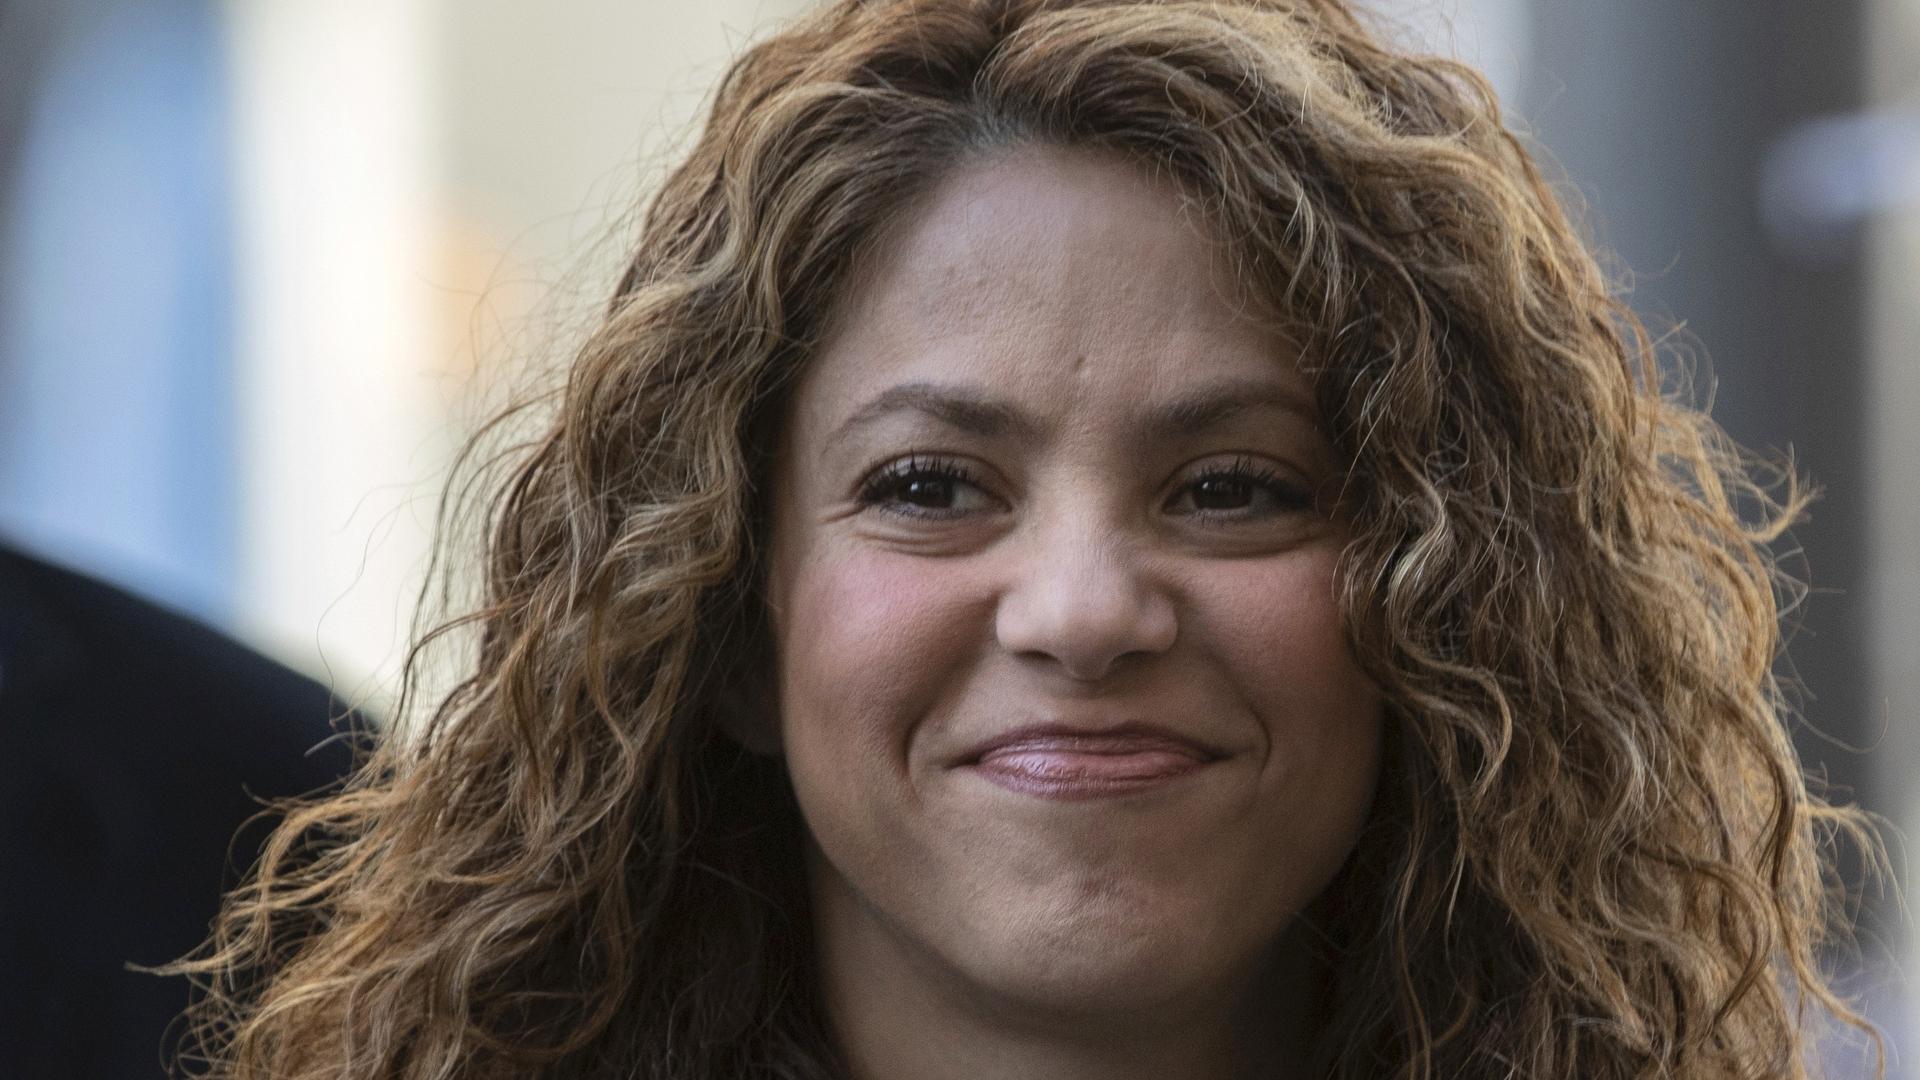 Interrogan a Shakira por un escándalo de fraude millonario